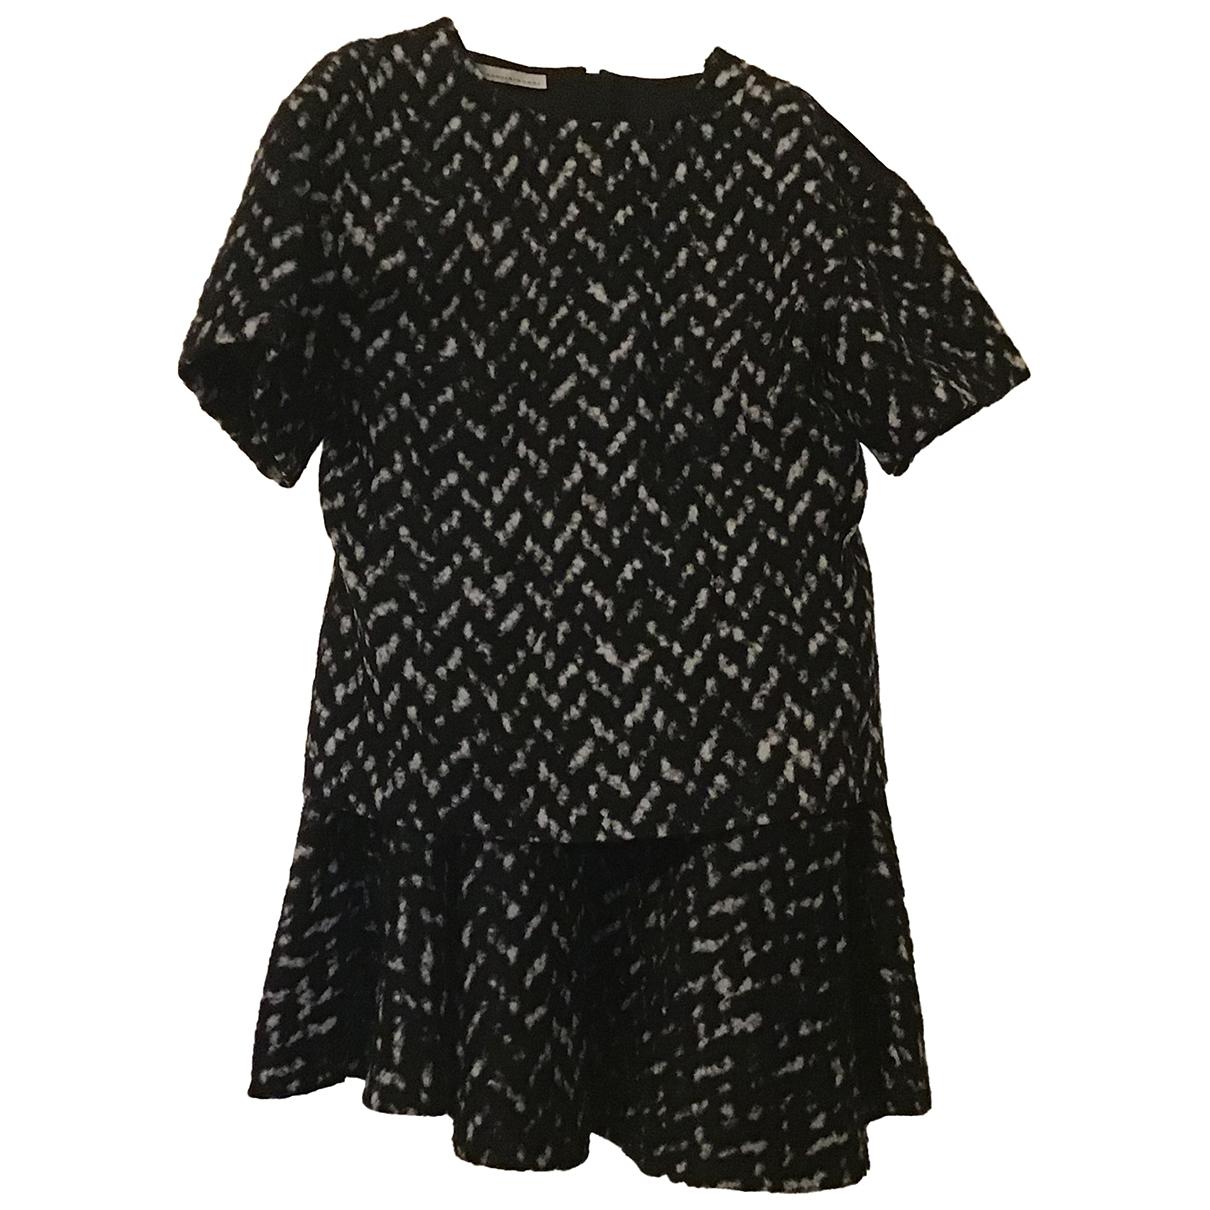 Aquilano Rimondi \N Multicolour Wool dress for Women 42 IT